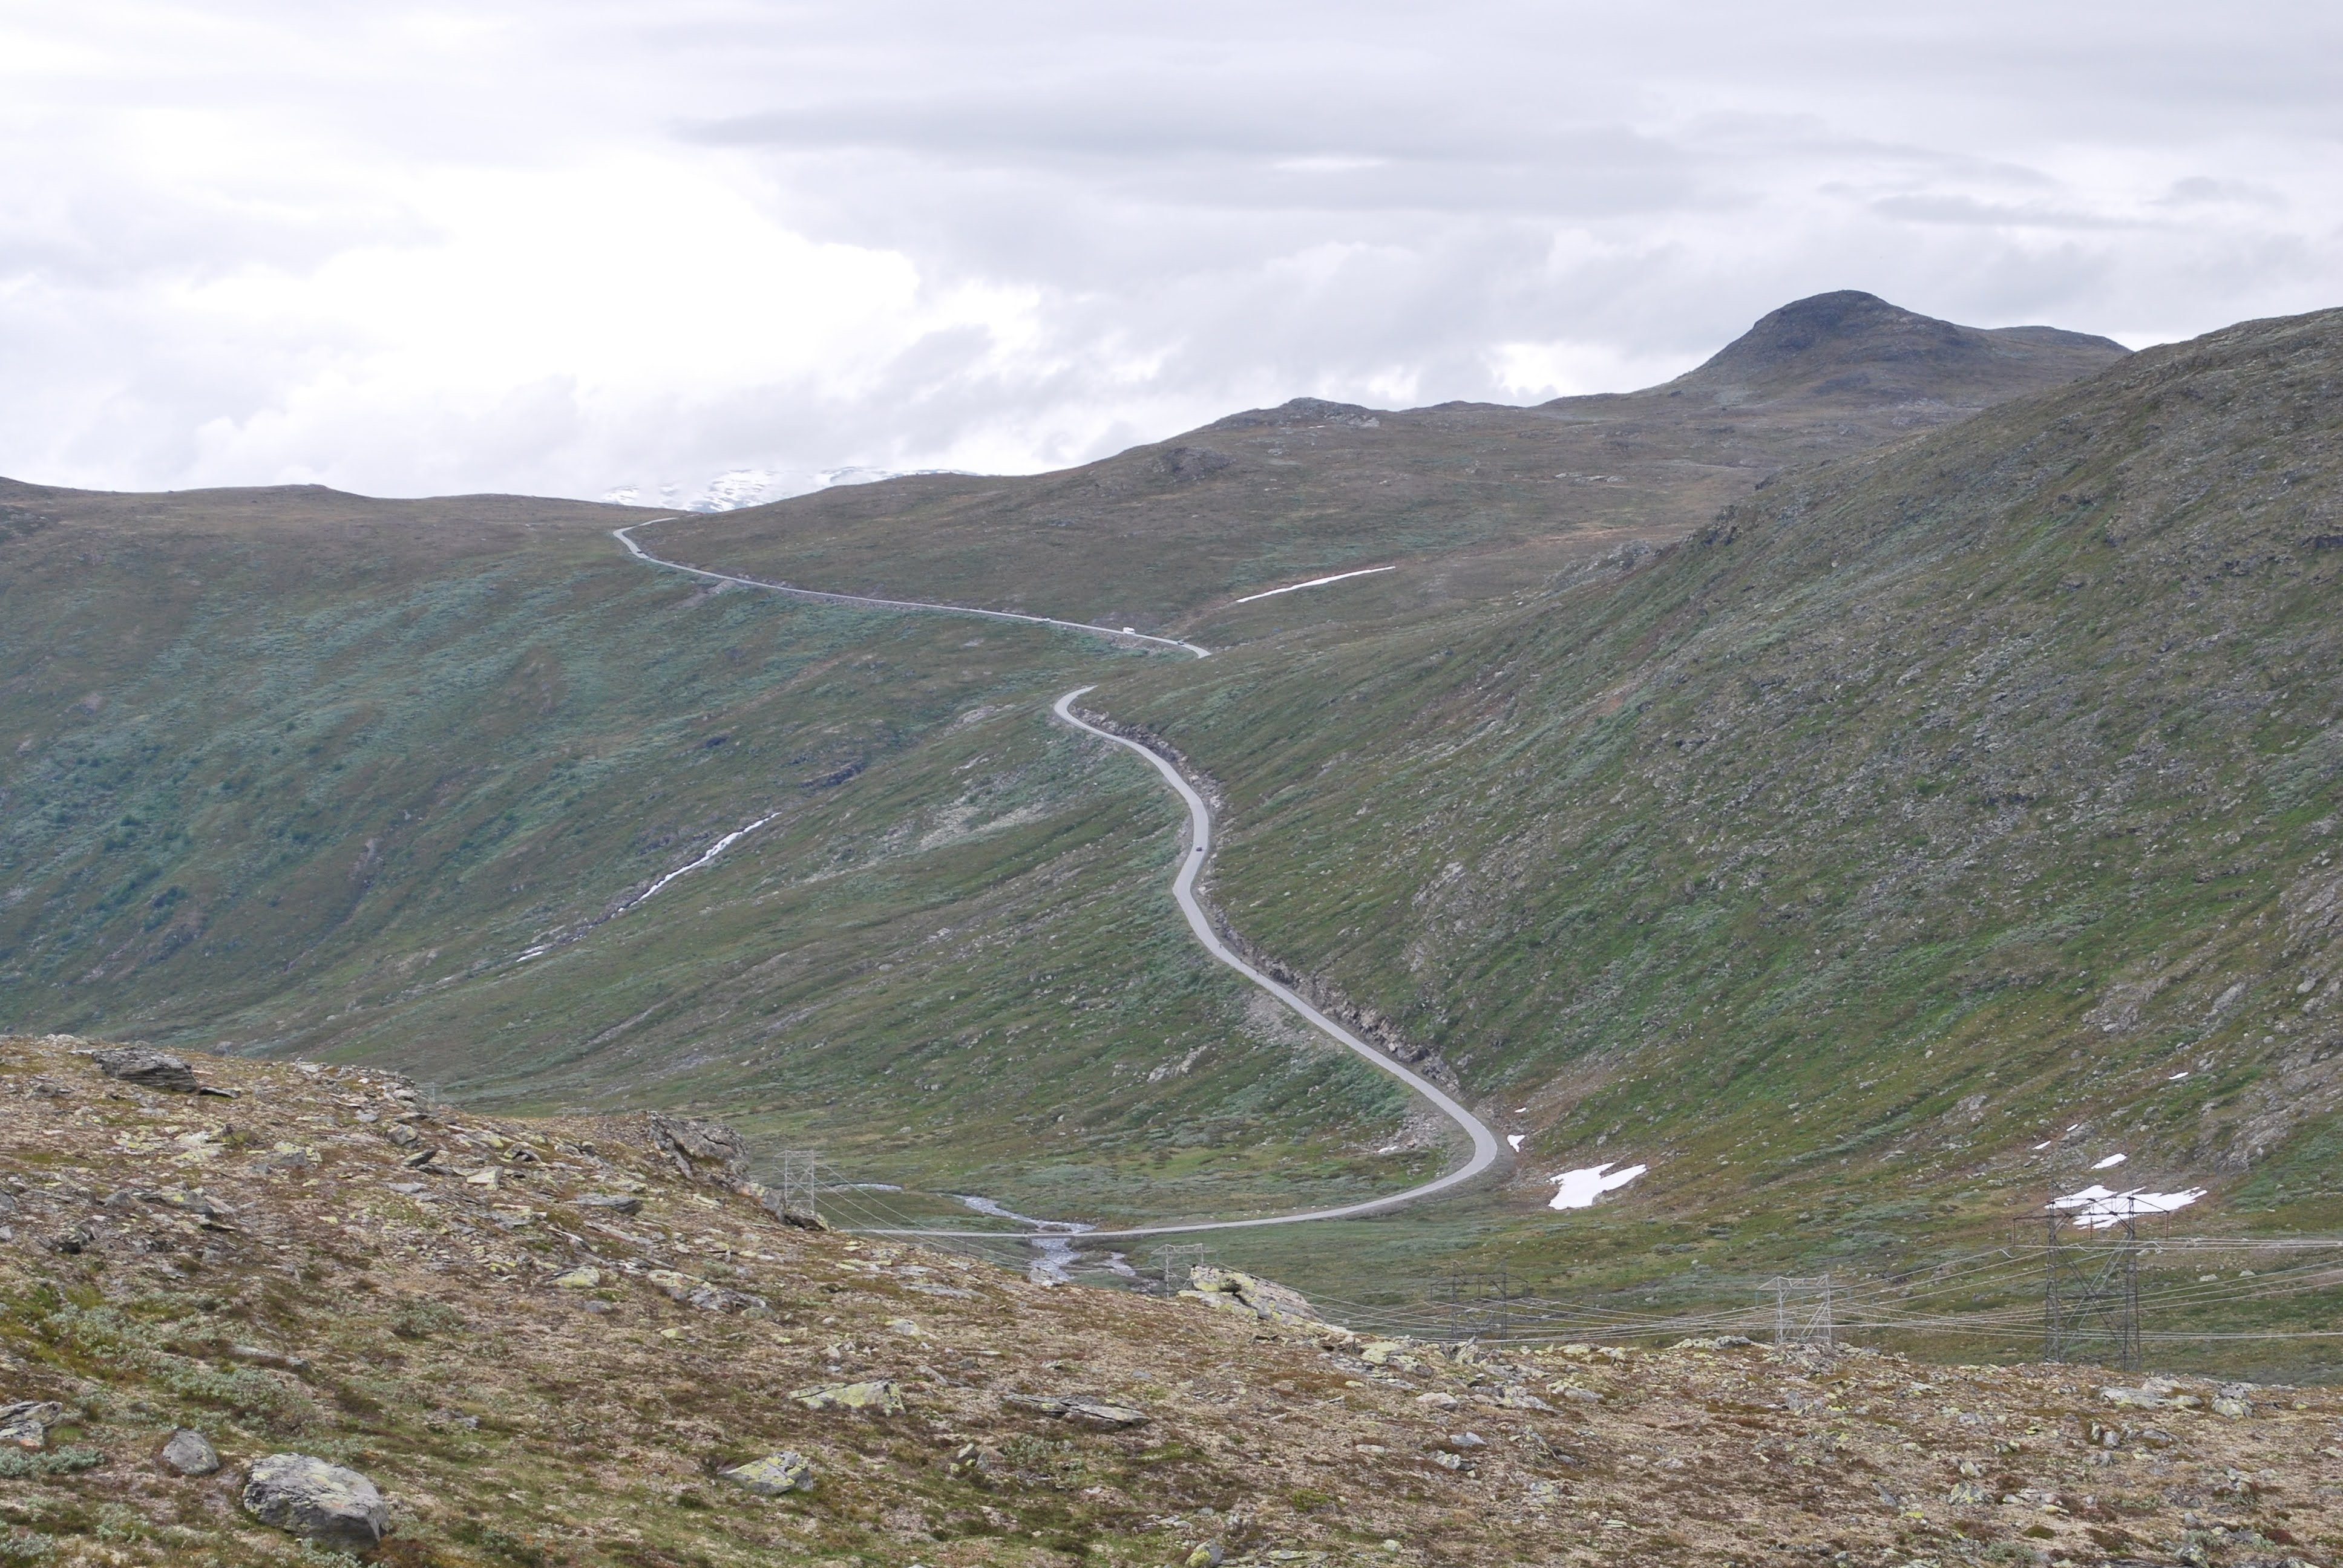 Everesting Roam i Jotunheimen (26.-27.06.2021)